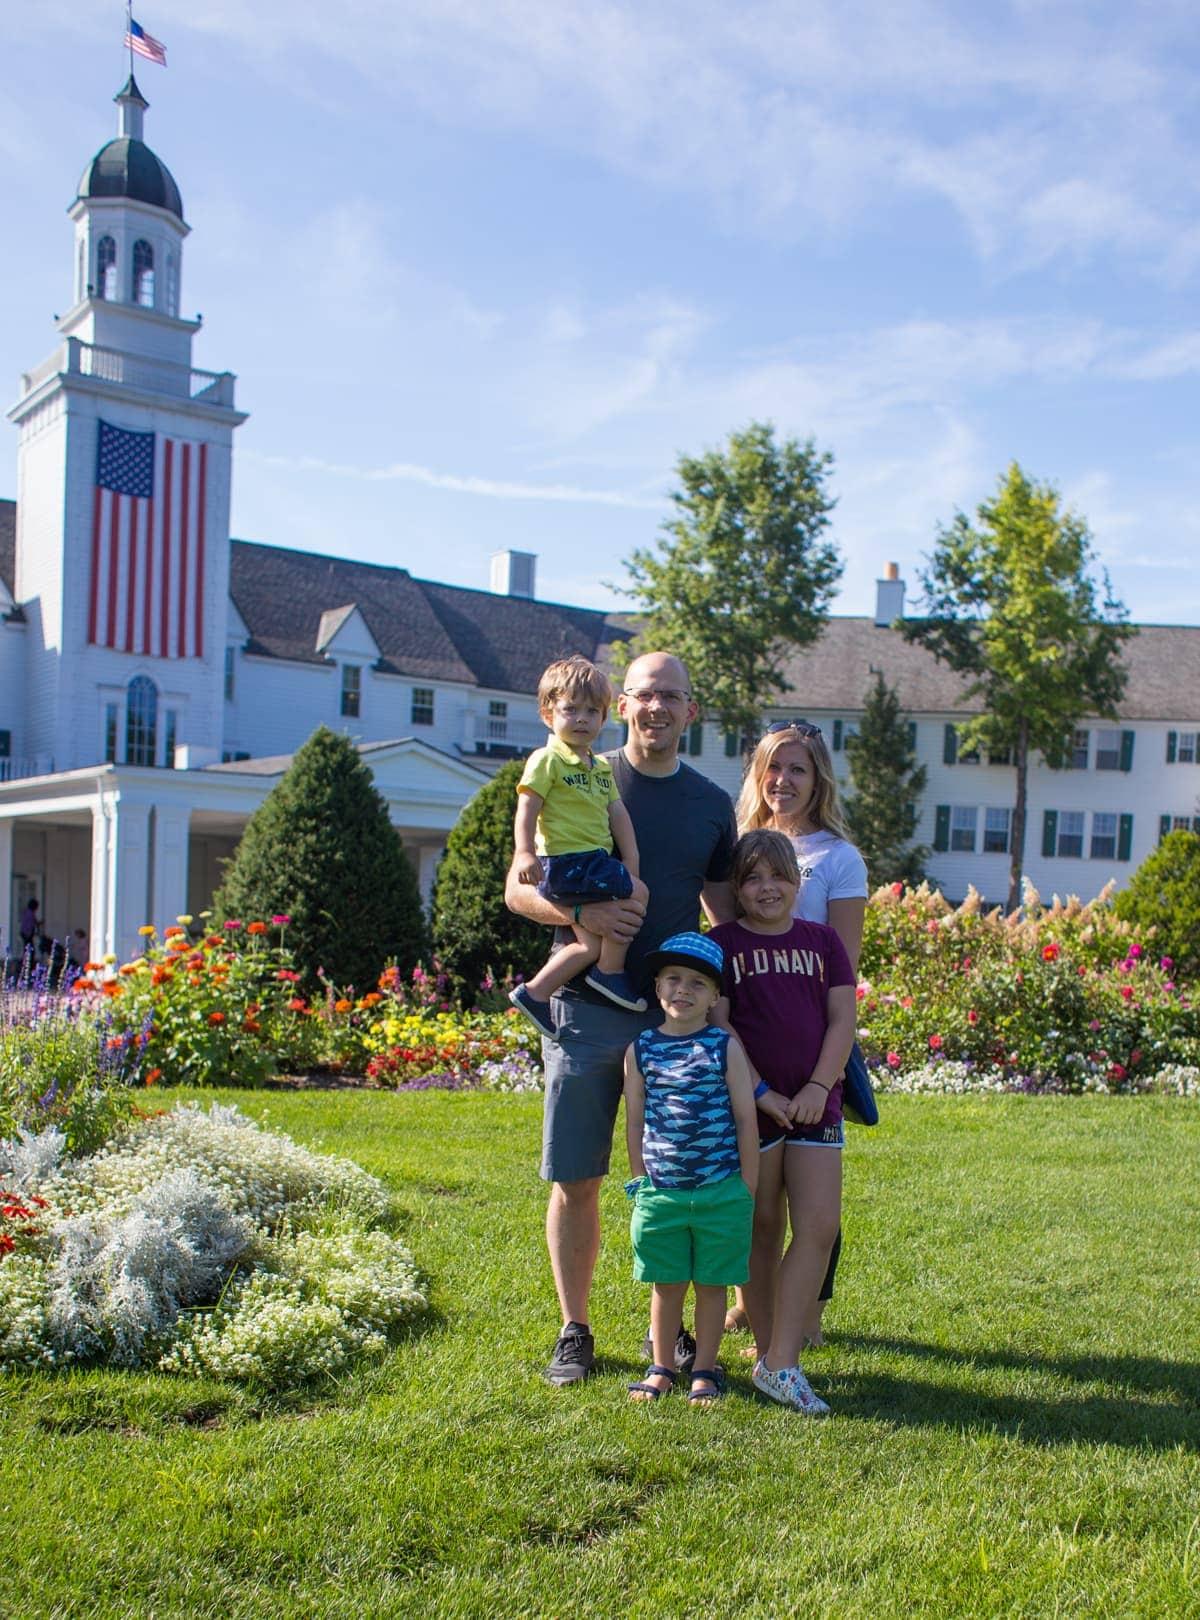 Brennan family standing in a grassy yard